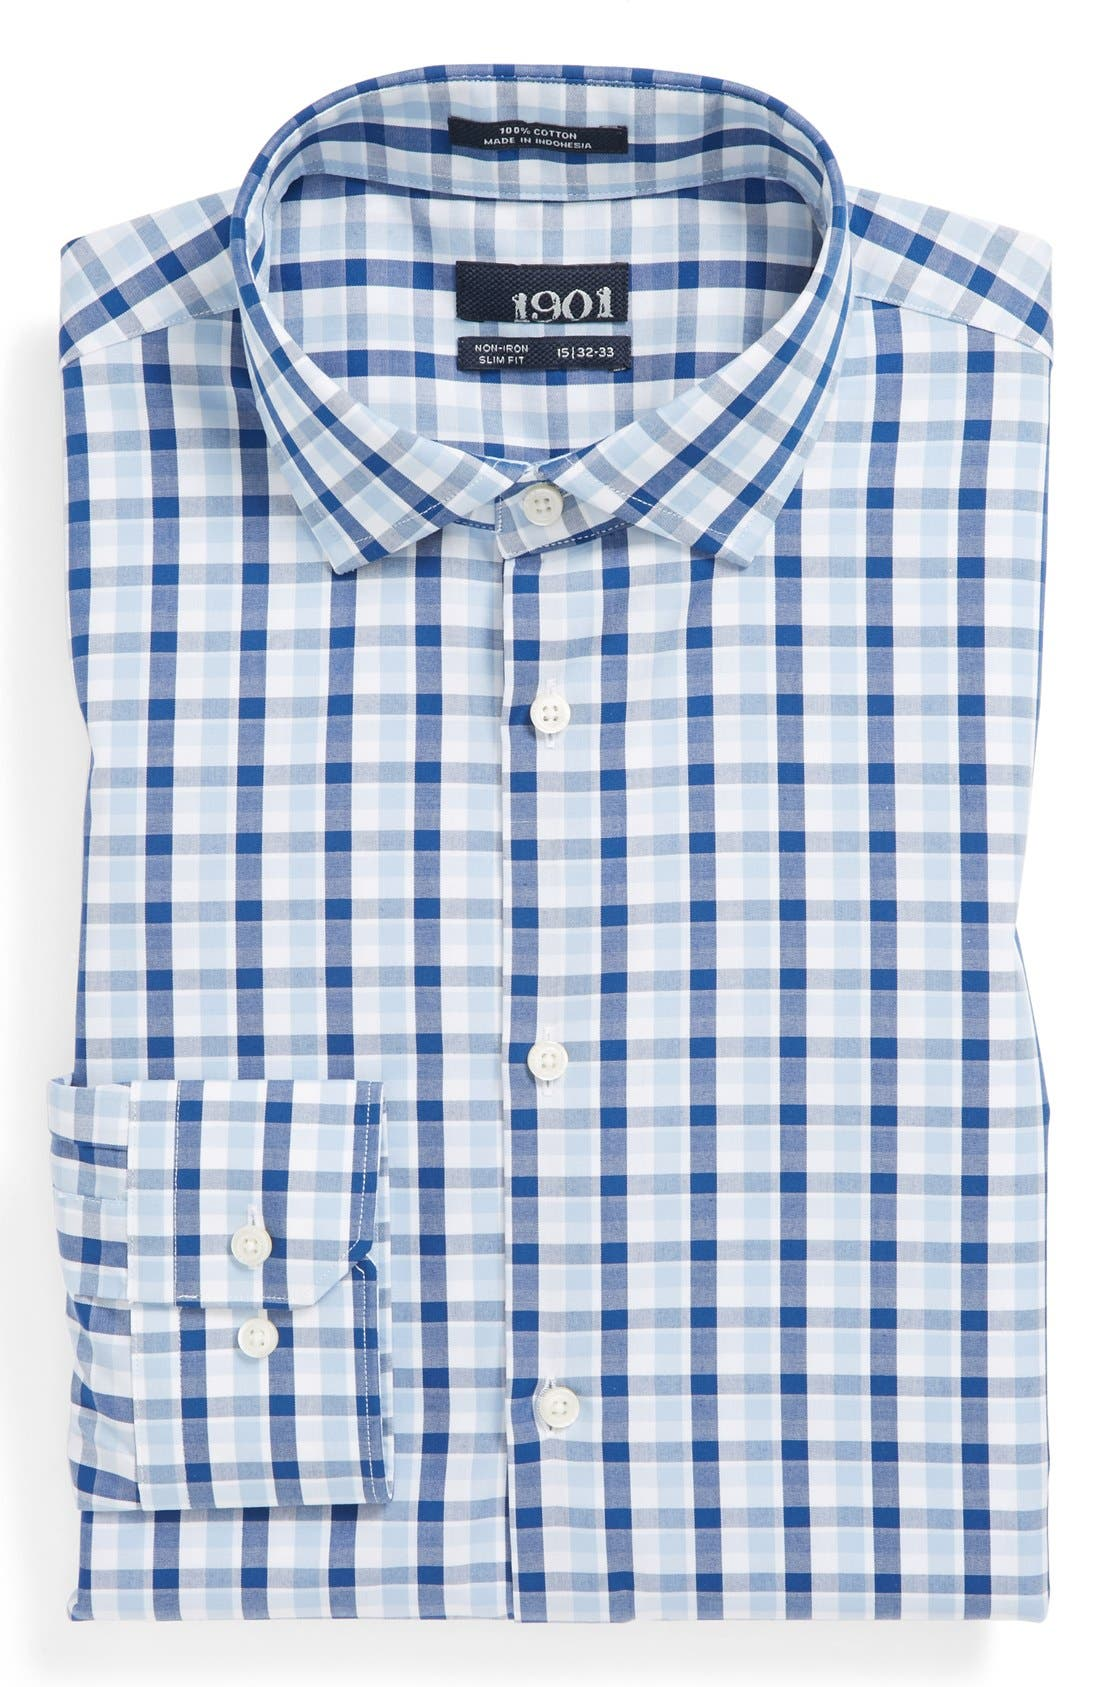 Main Image - 1901 Slim Fit Non-Iron Check Dress Shirt